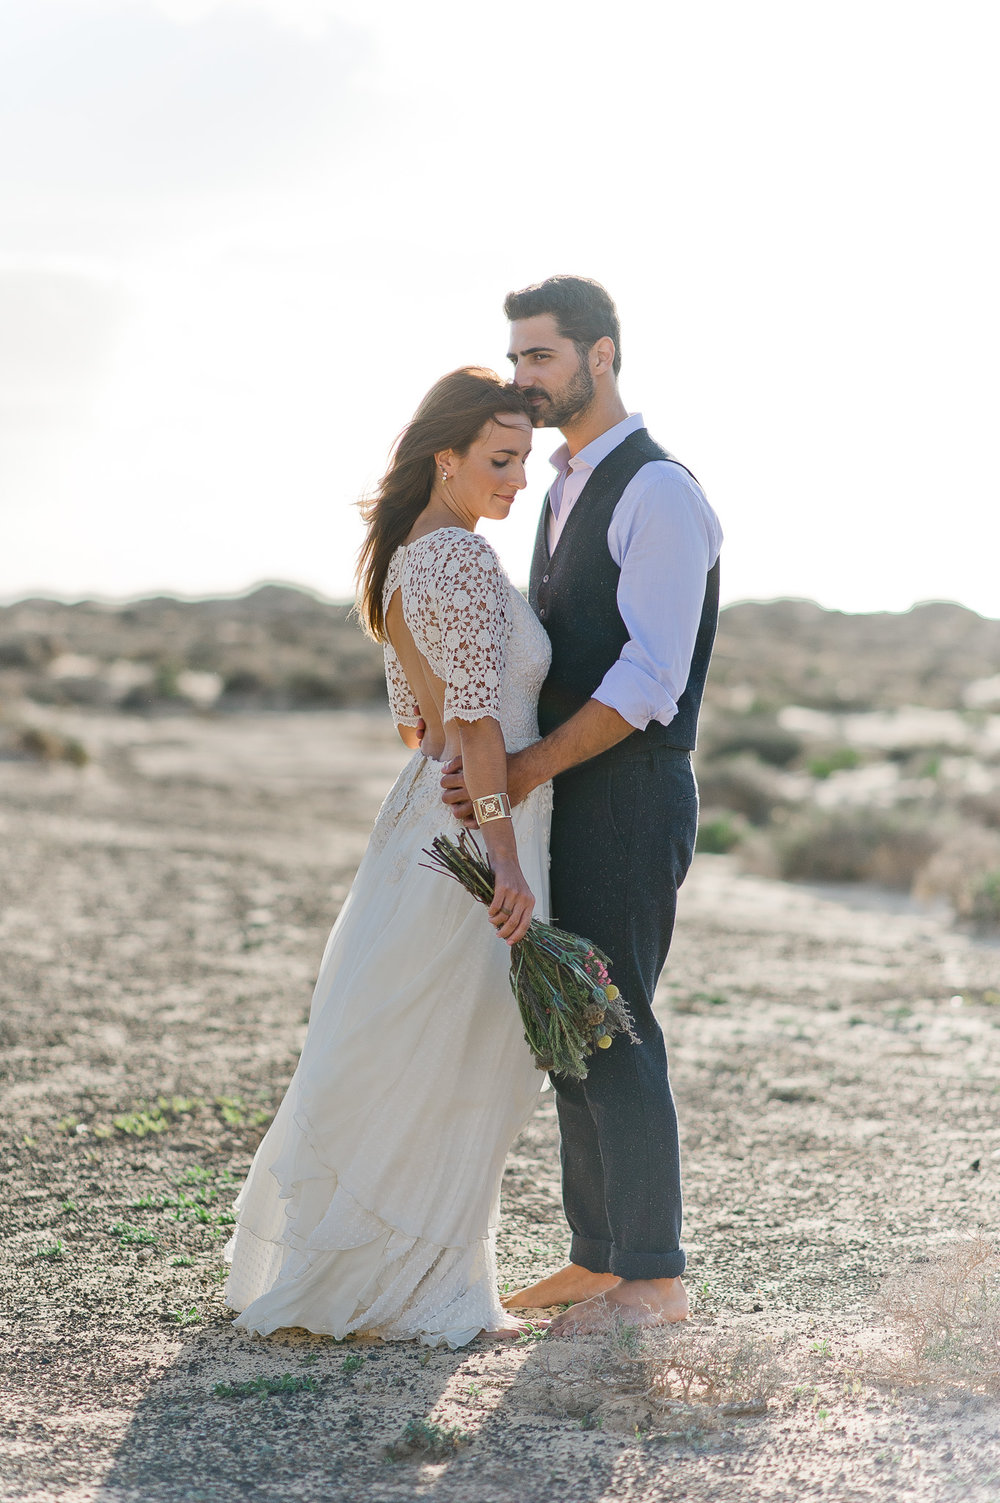 anna hari wedding photography-32.jpg